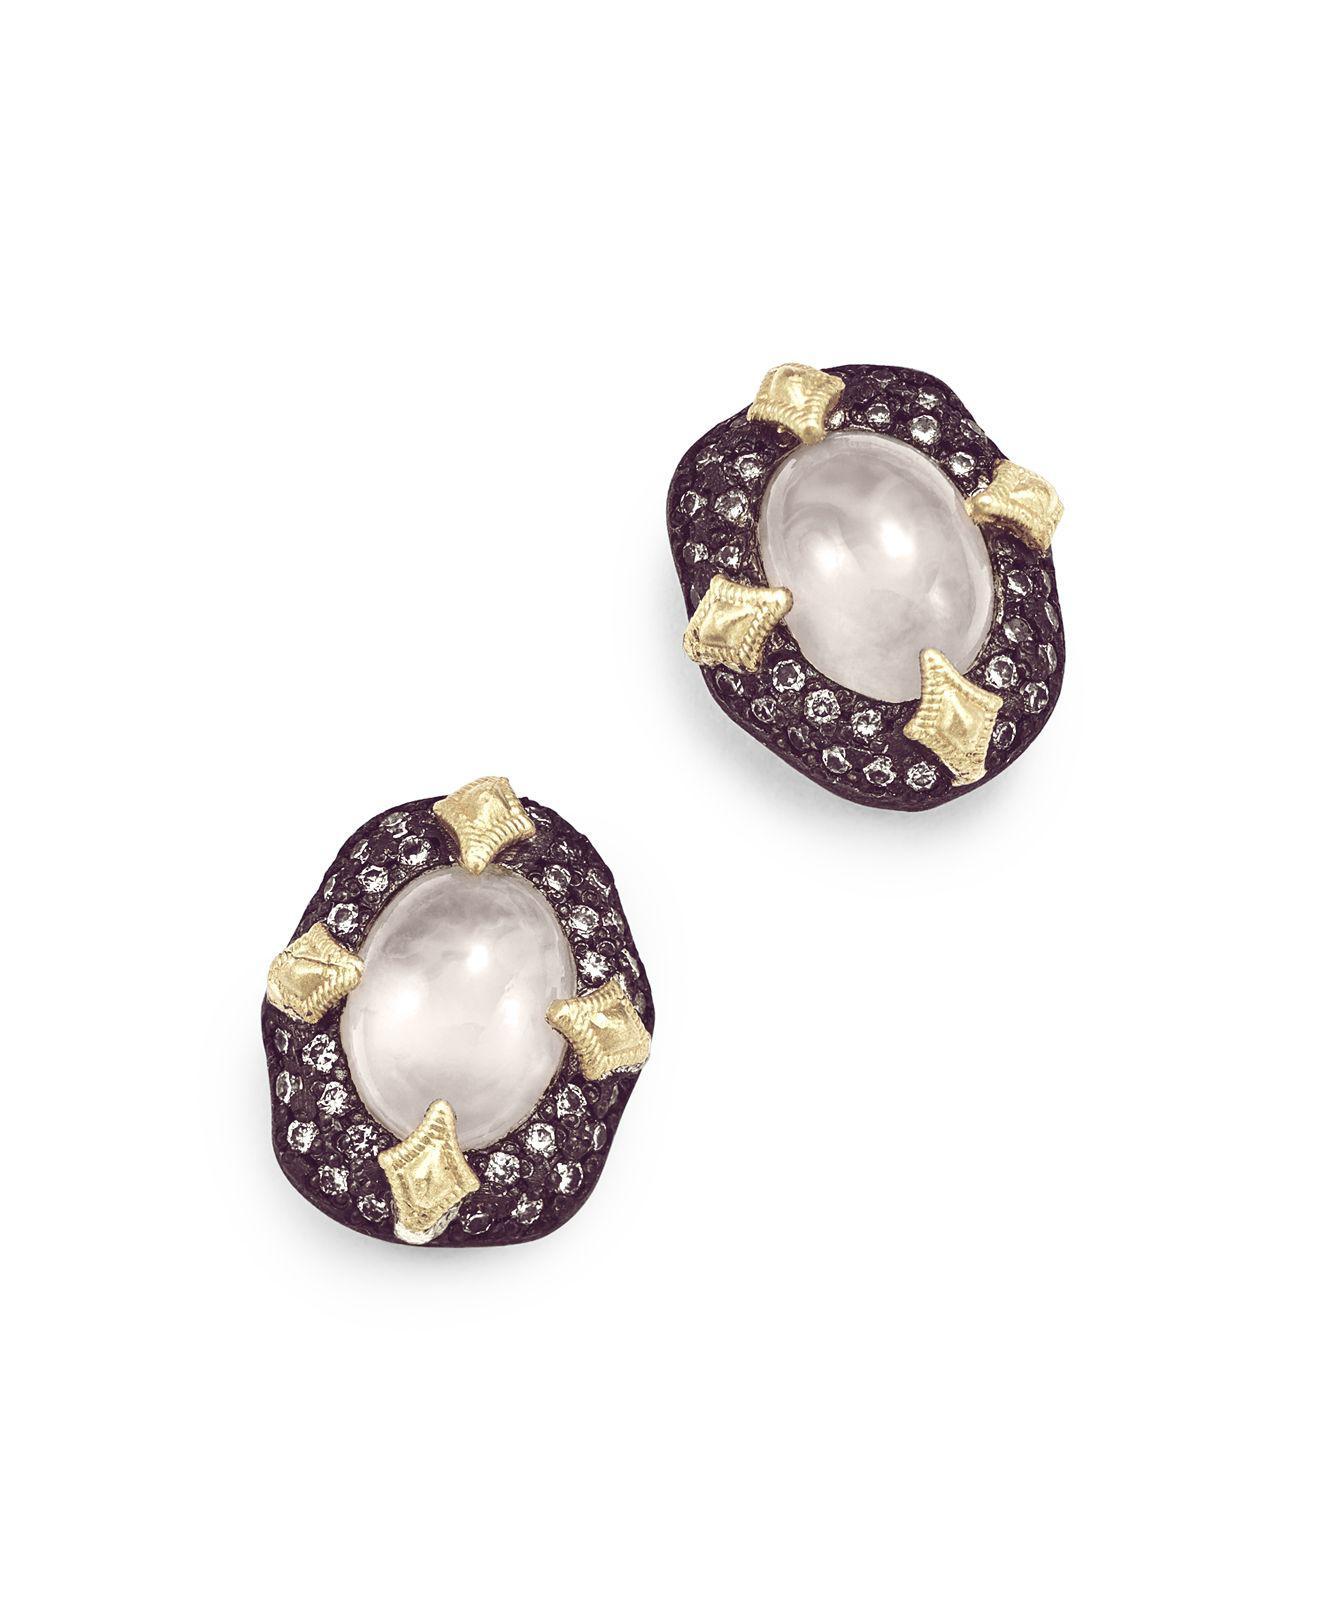 Armenta Old World 18k Starburst Aquaprase Stud Earrings 5iMLQg